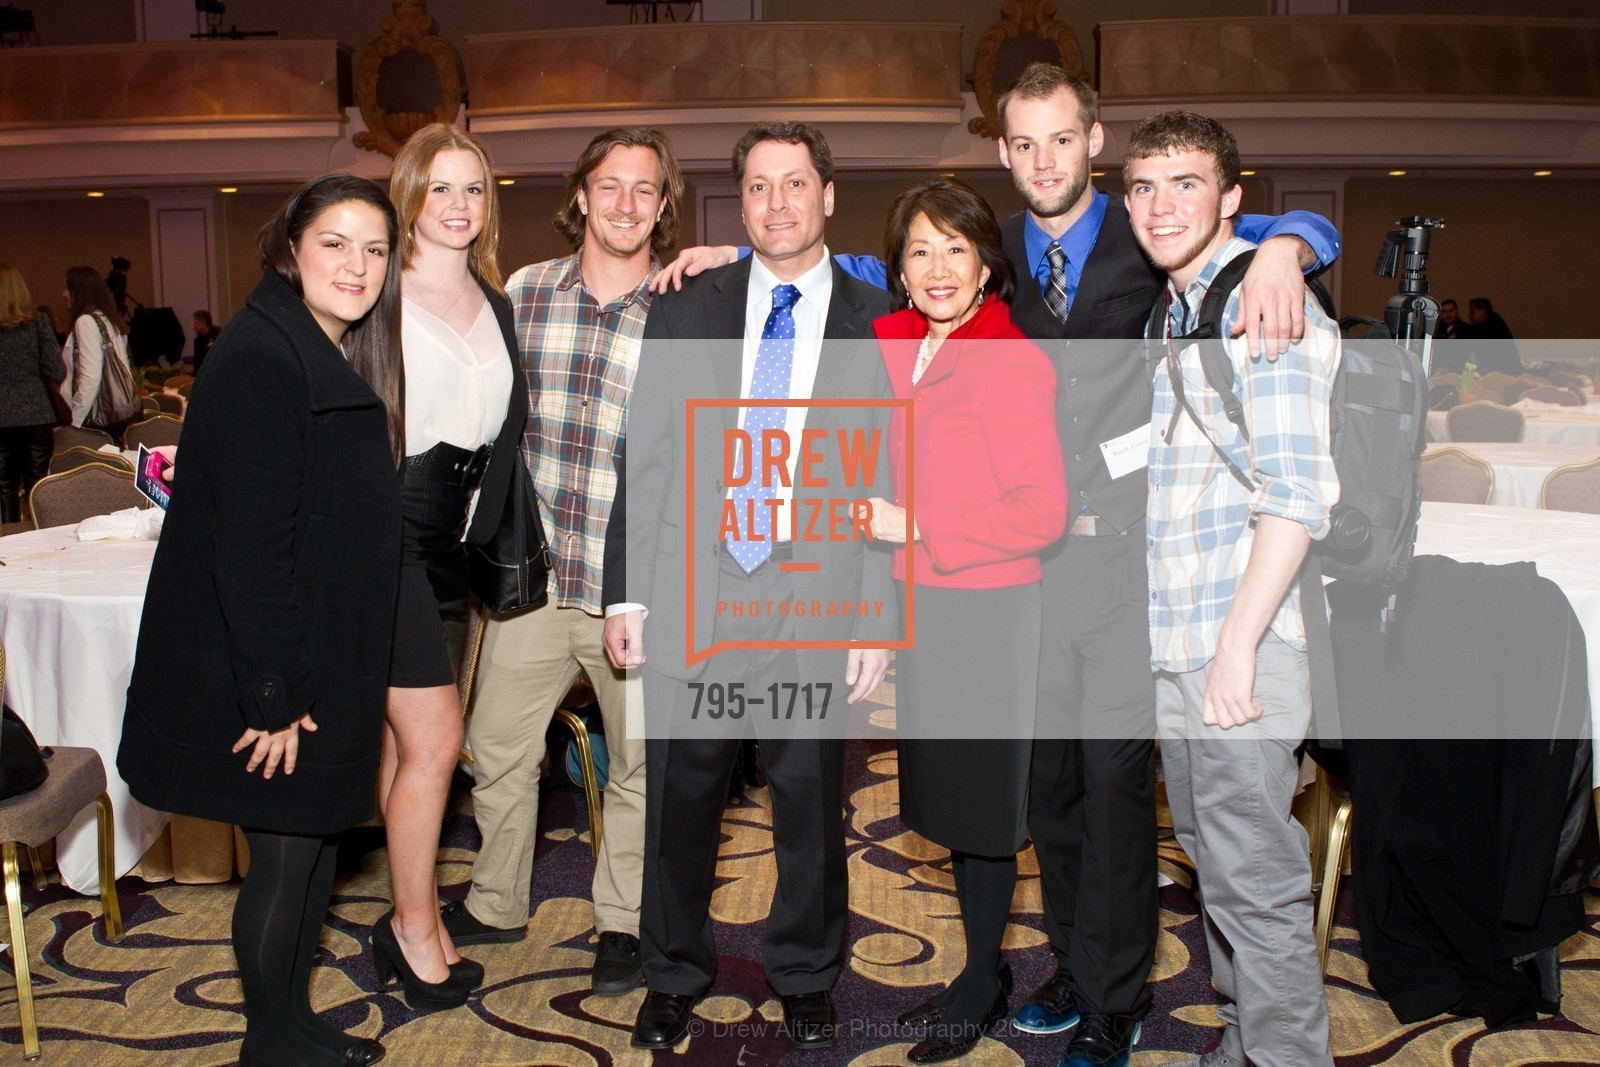 Alejandra Galan, Morgan McKnight, Todd Stave, Jan Yanehiro, Brett Force, Photo #795-1717